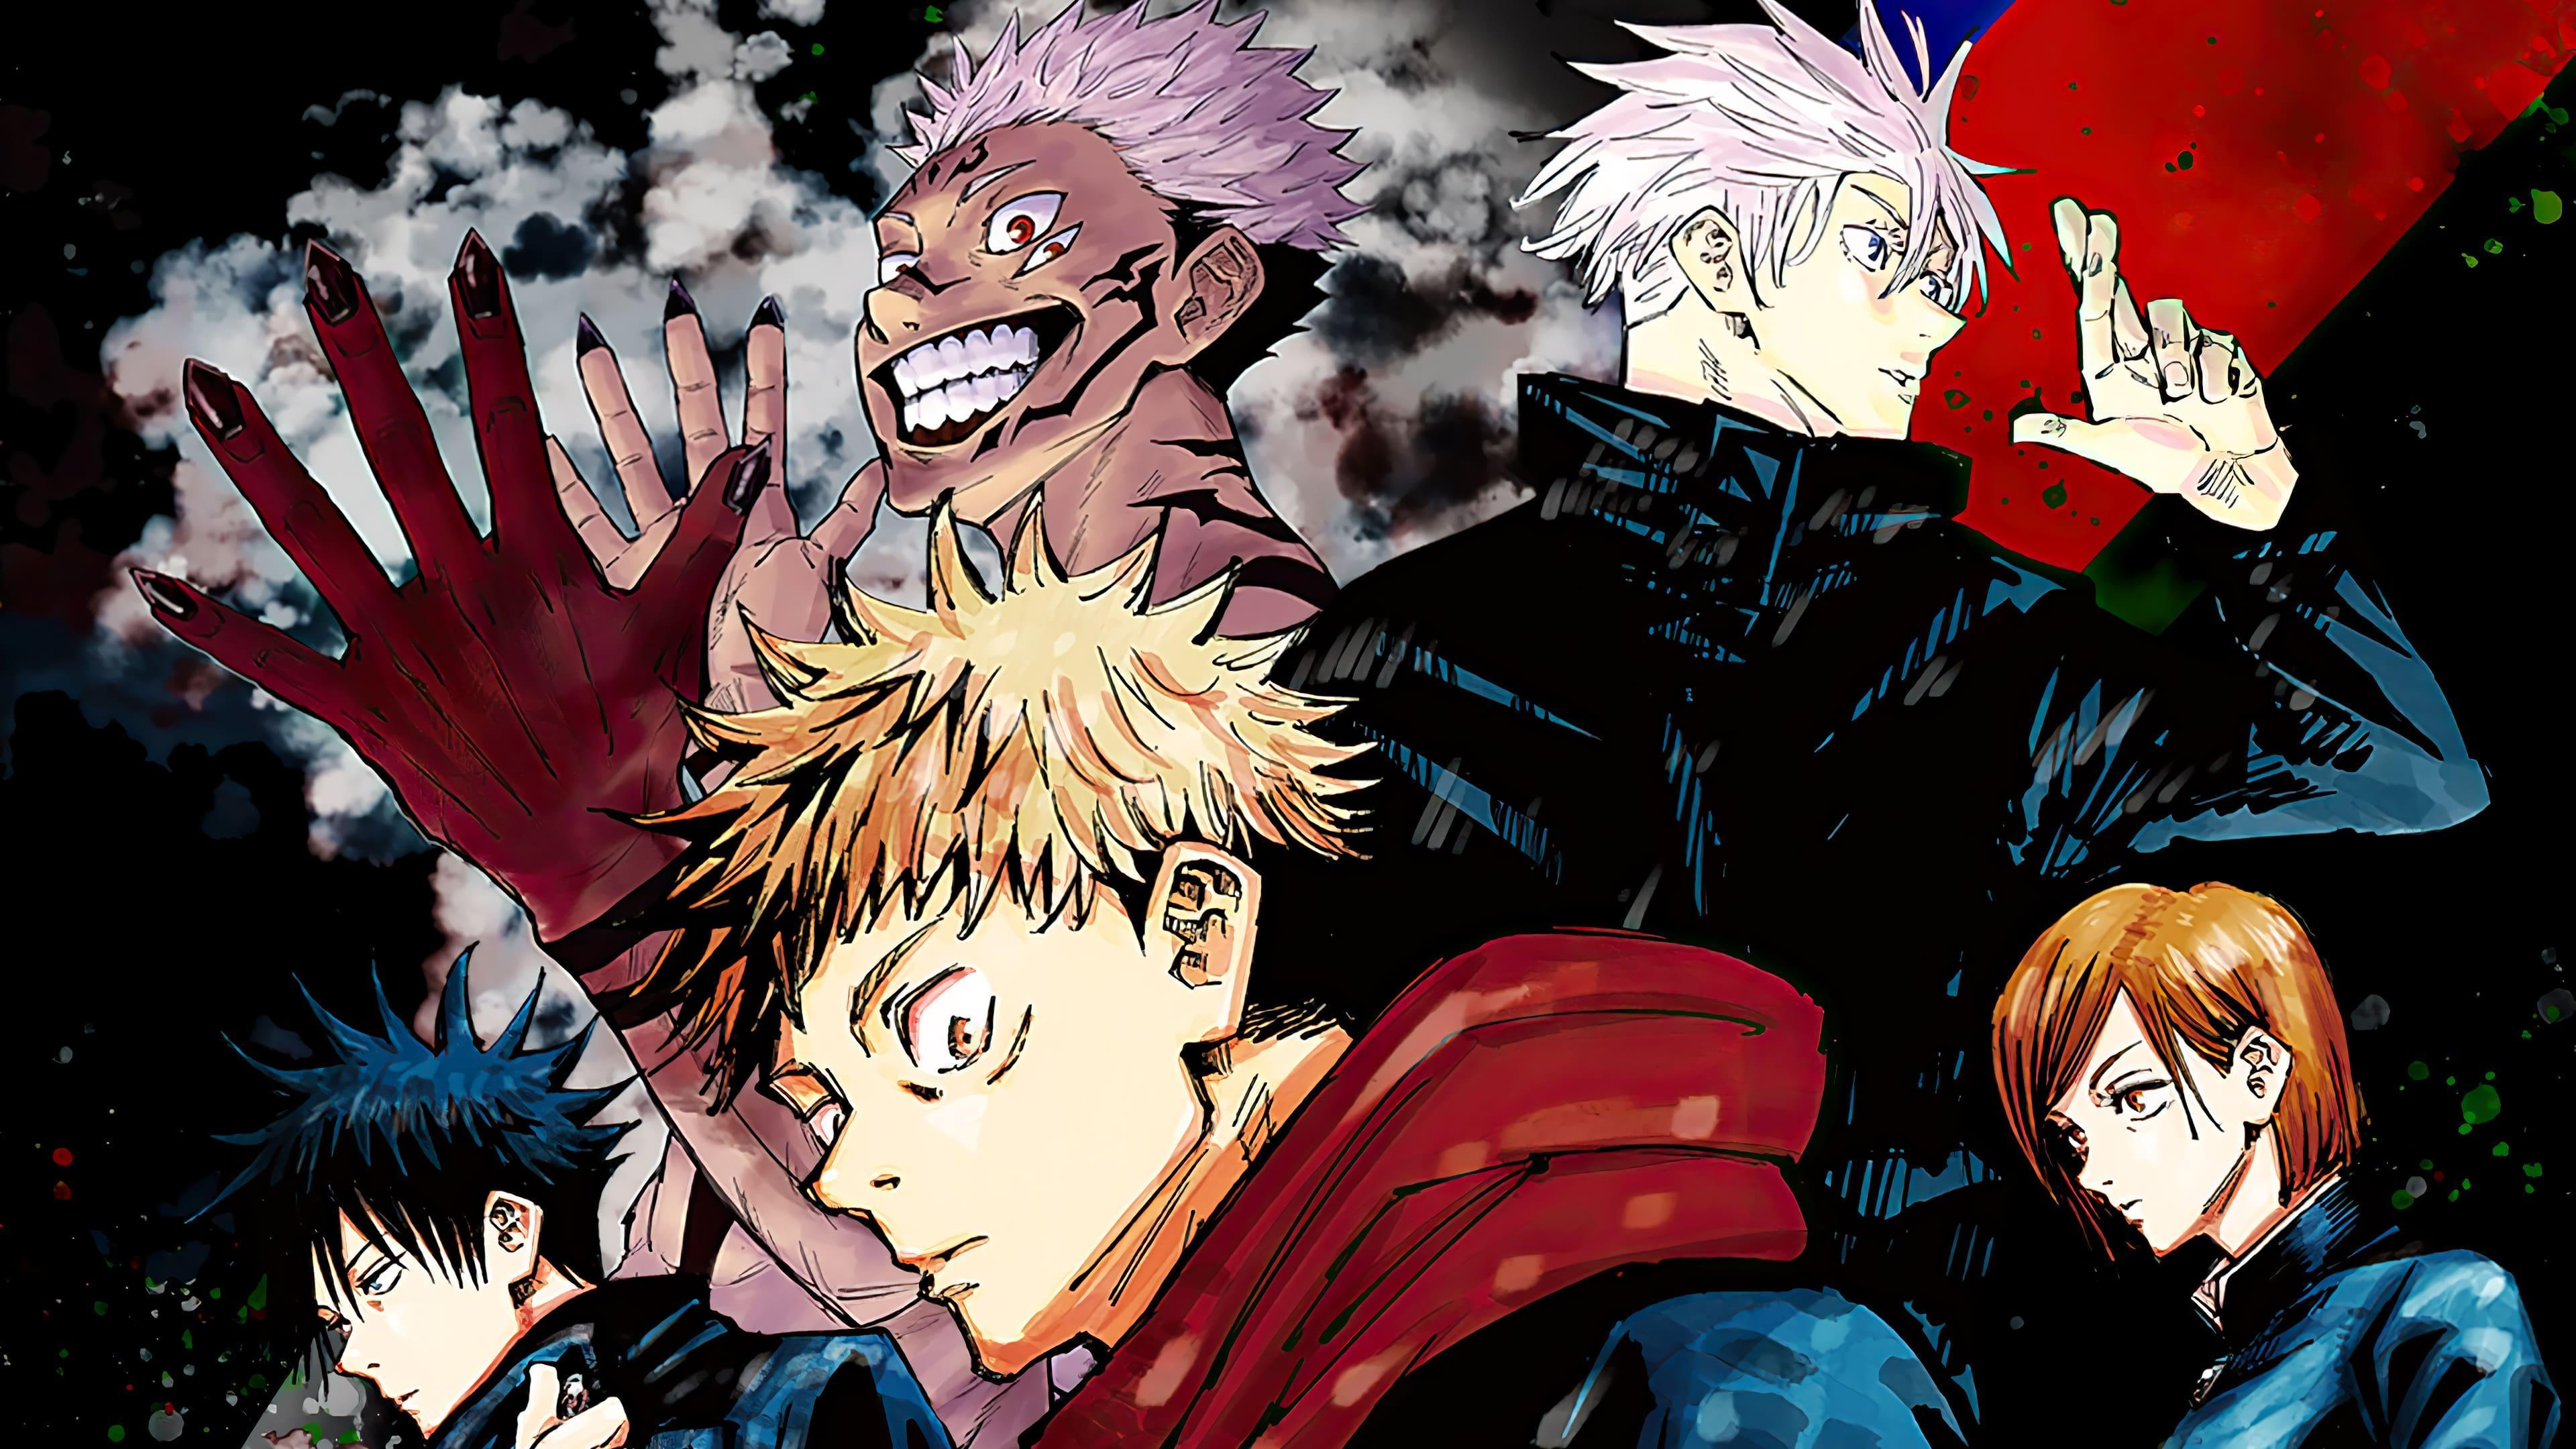 Jujutsu Kaisen: Top 10 Fan-Favorite Characters